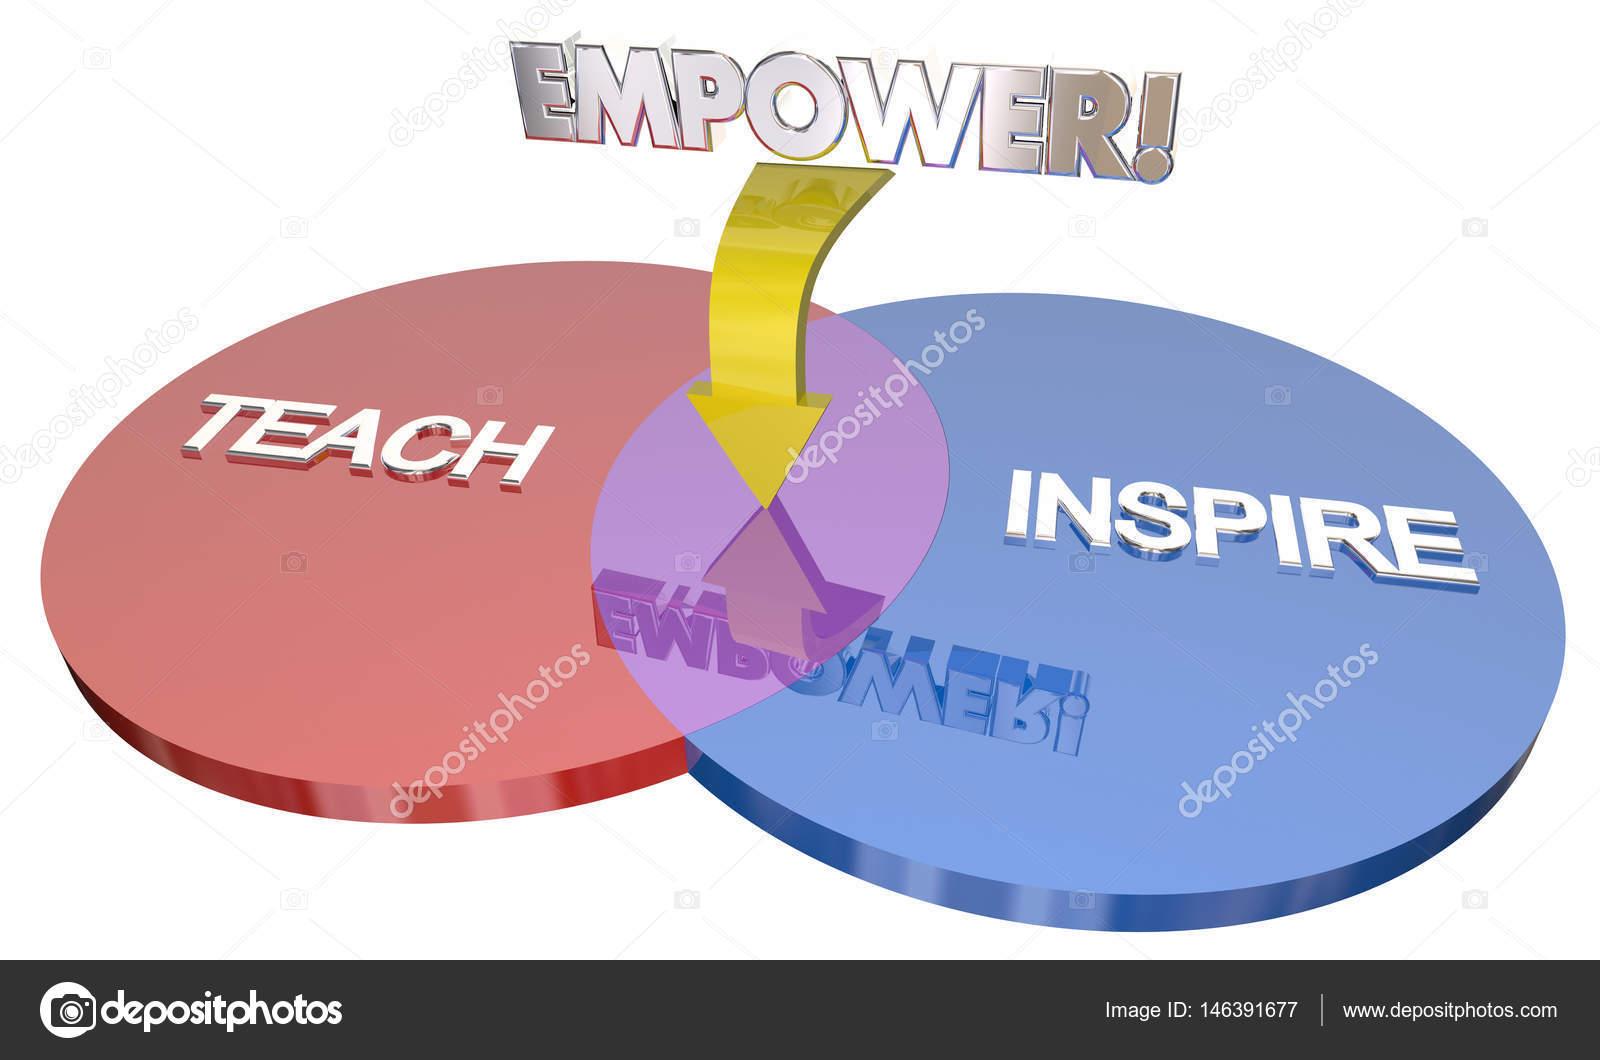 hight resolution of teach inspire empower education goals venn diagram 3d illustration photo by iqoncept